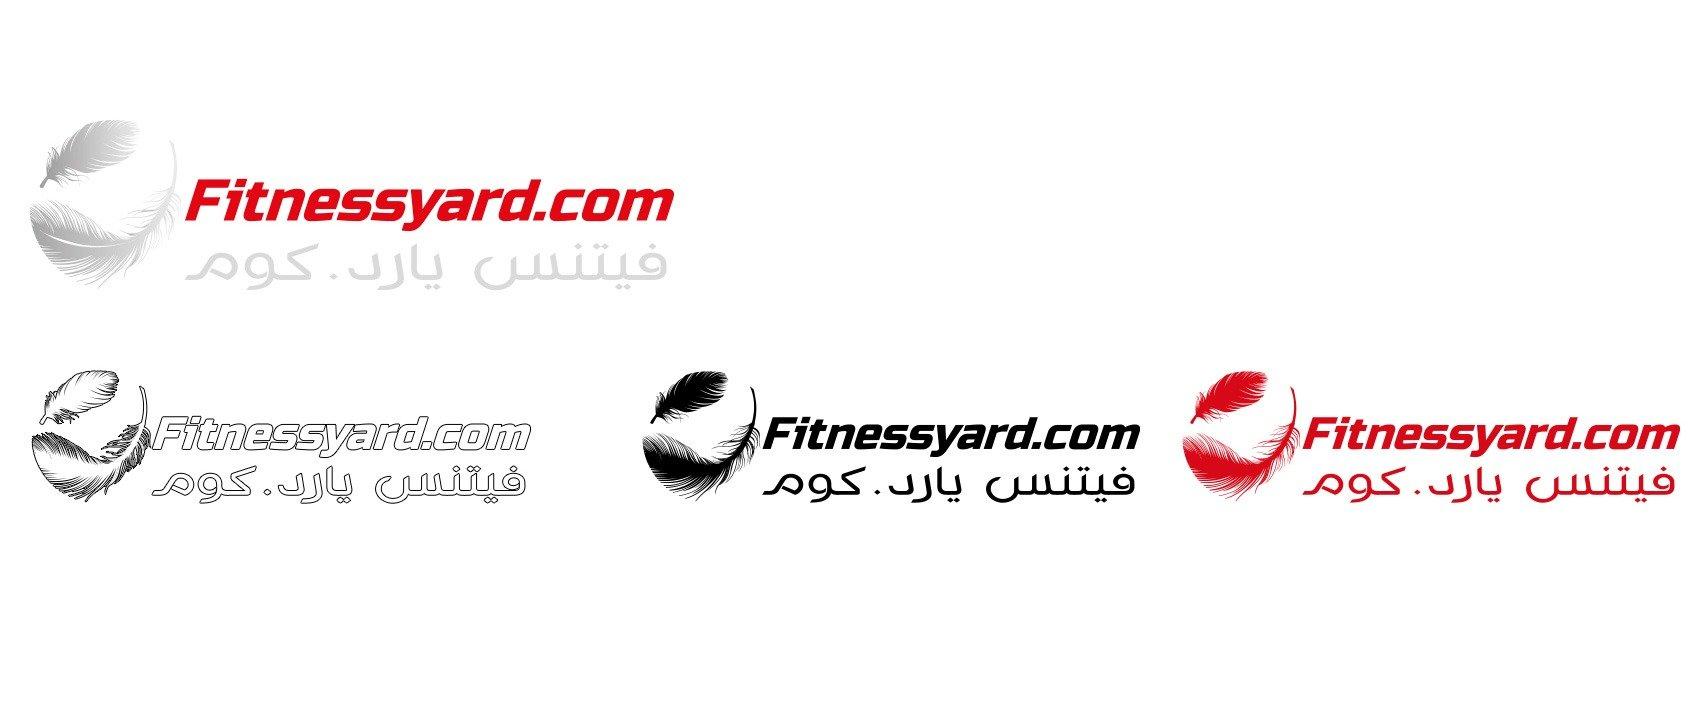 fitnessyard logo colors variations